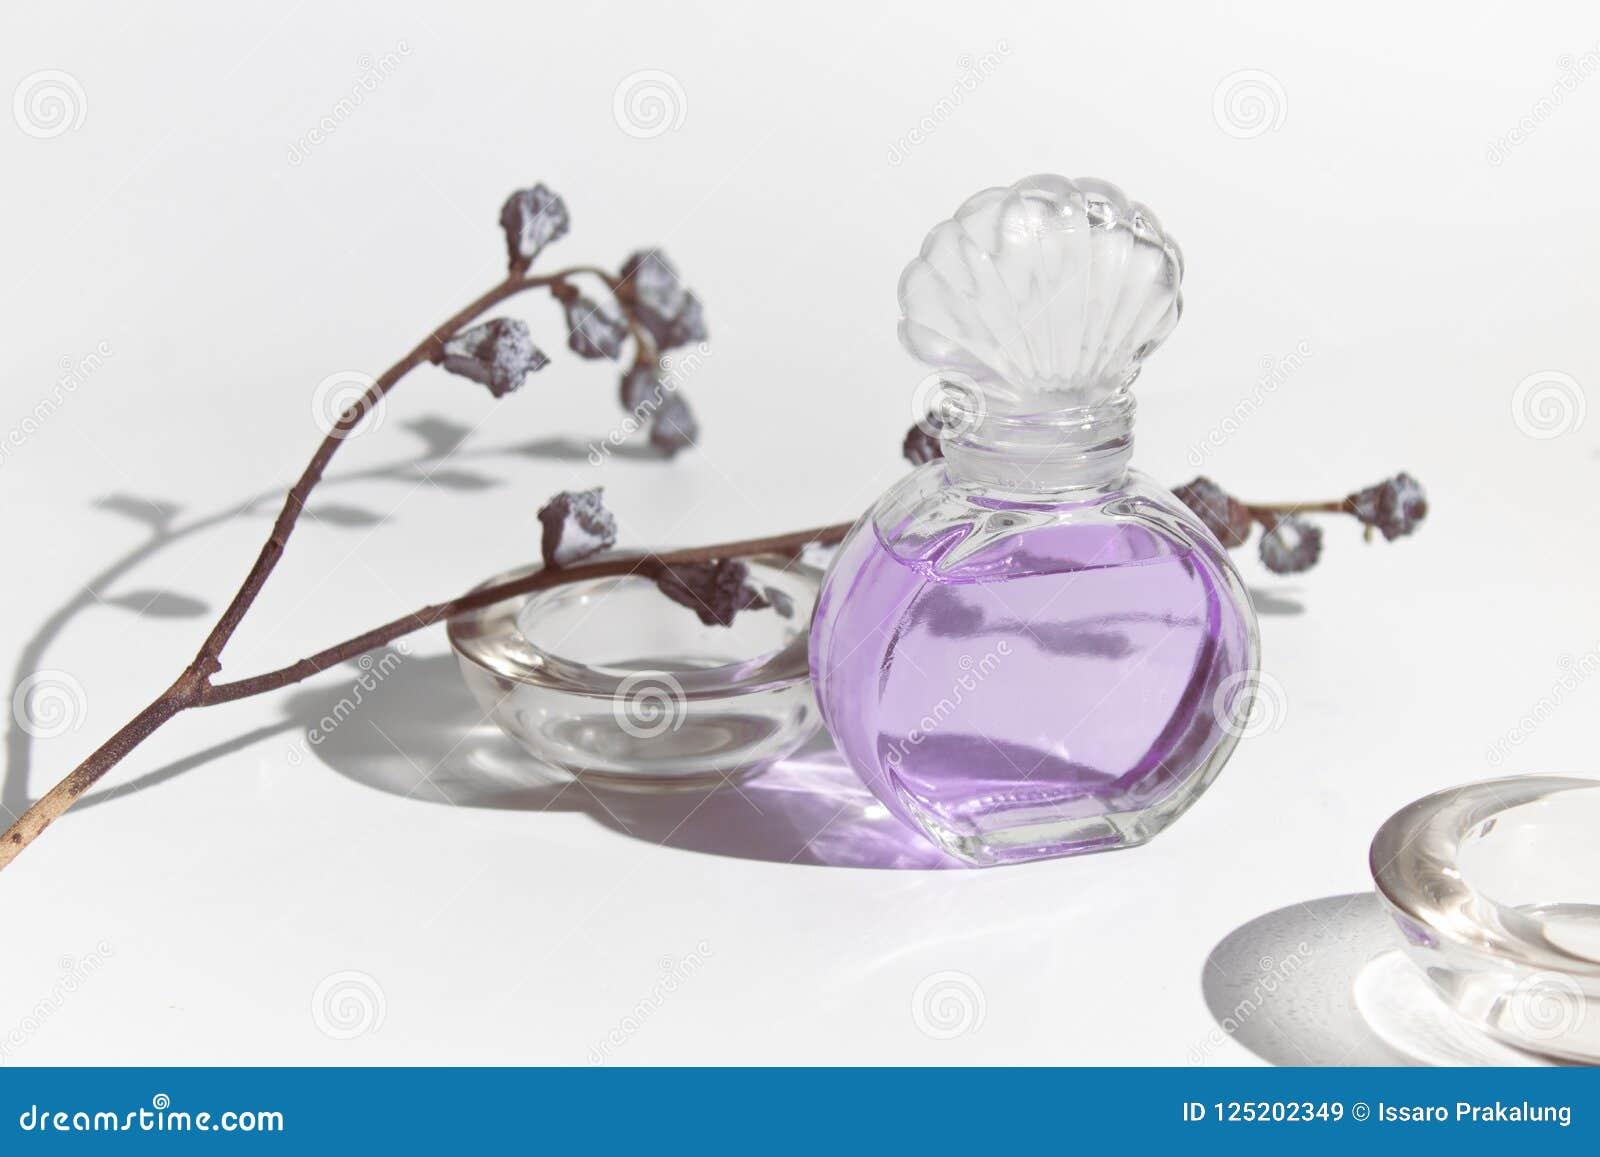 Garrafa de vidro do modelo da beleza cosmética roxa do perfume do cheiro da alfazema com a flora secada da flor no fundo branco